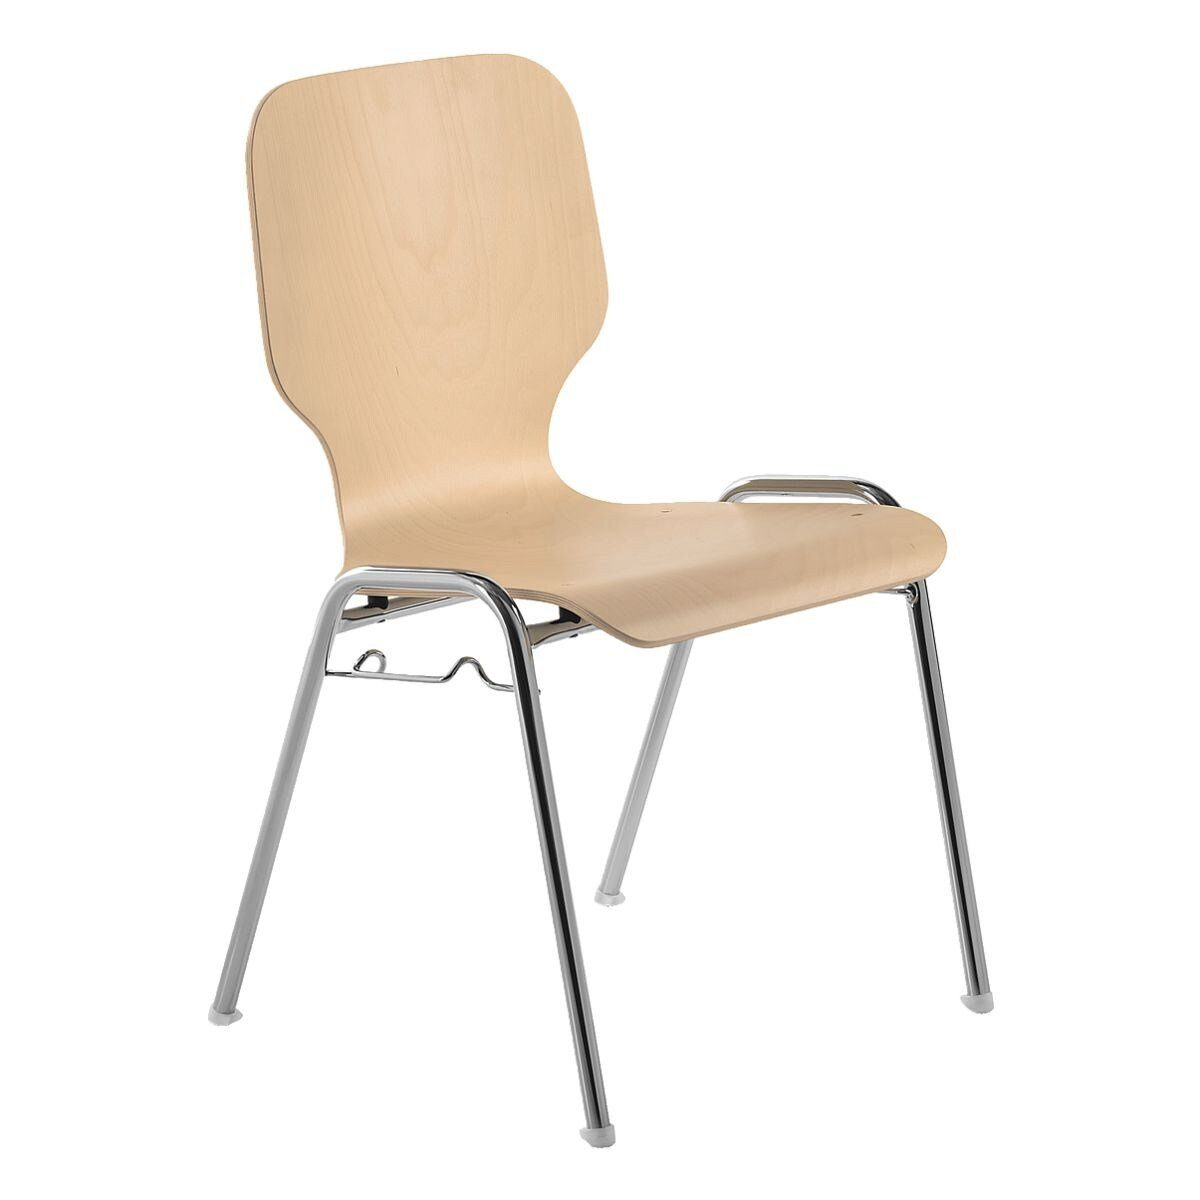 Mayer Sitzmöbel Stapelstuhl »my Dario« kaufen | OTTO